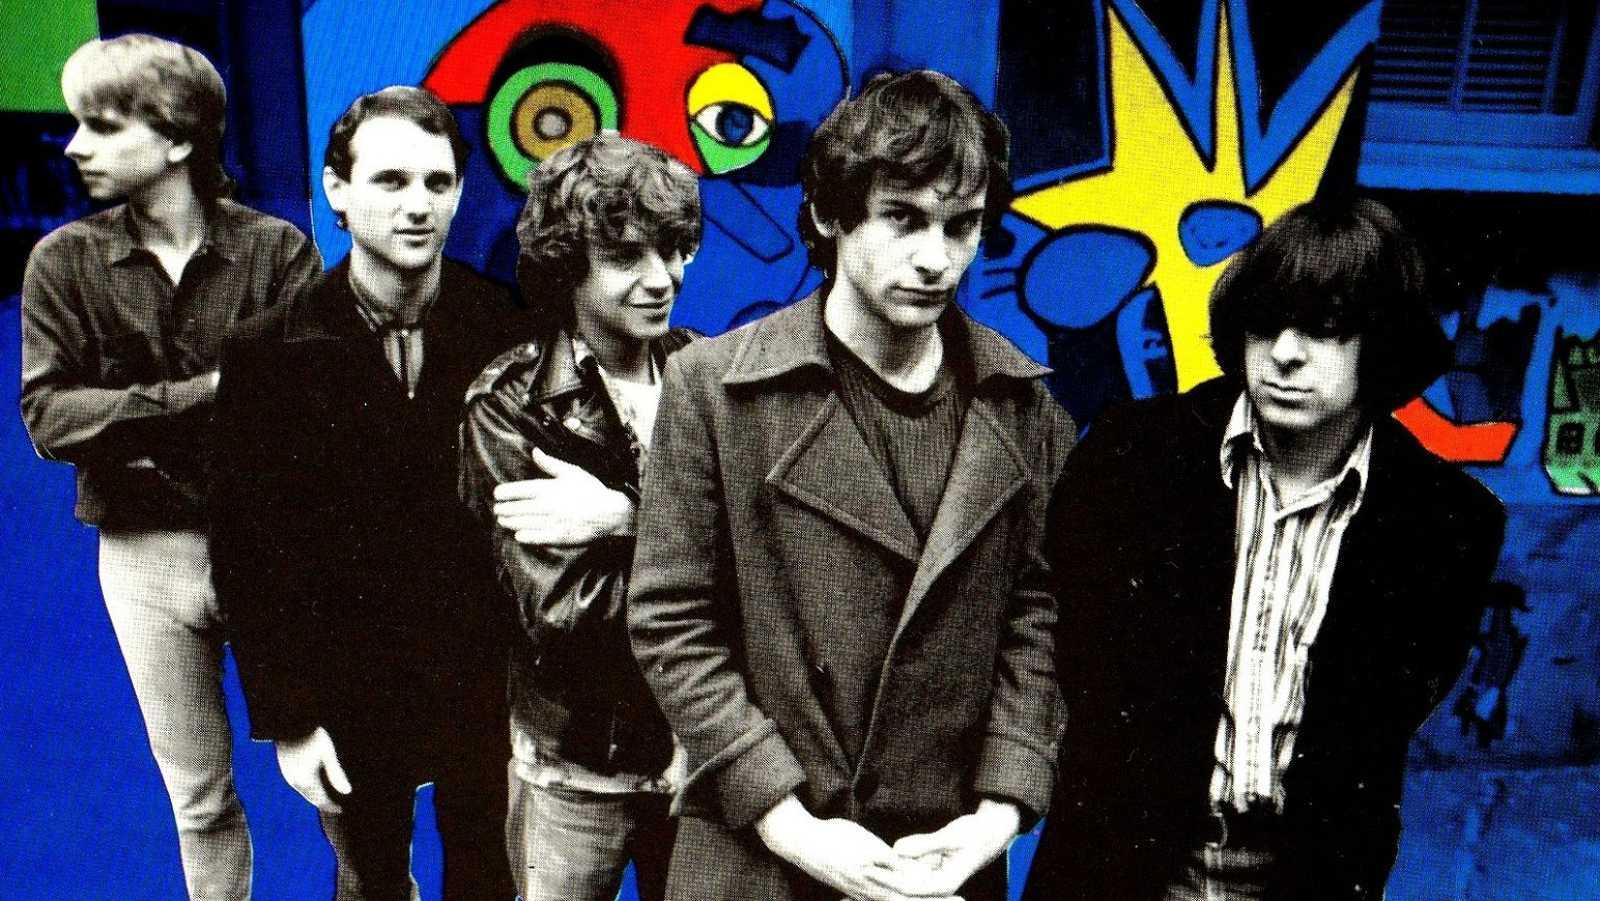 Amordiscos - Piscolabis Paisley Underground - 10/03/21